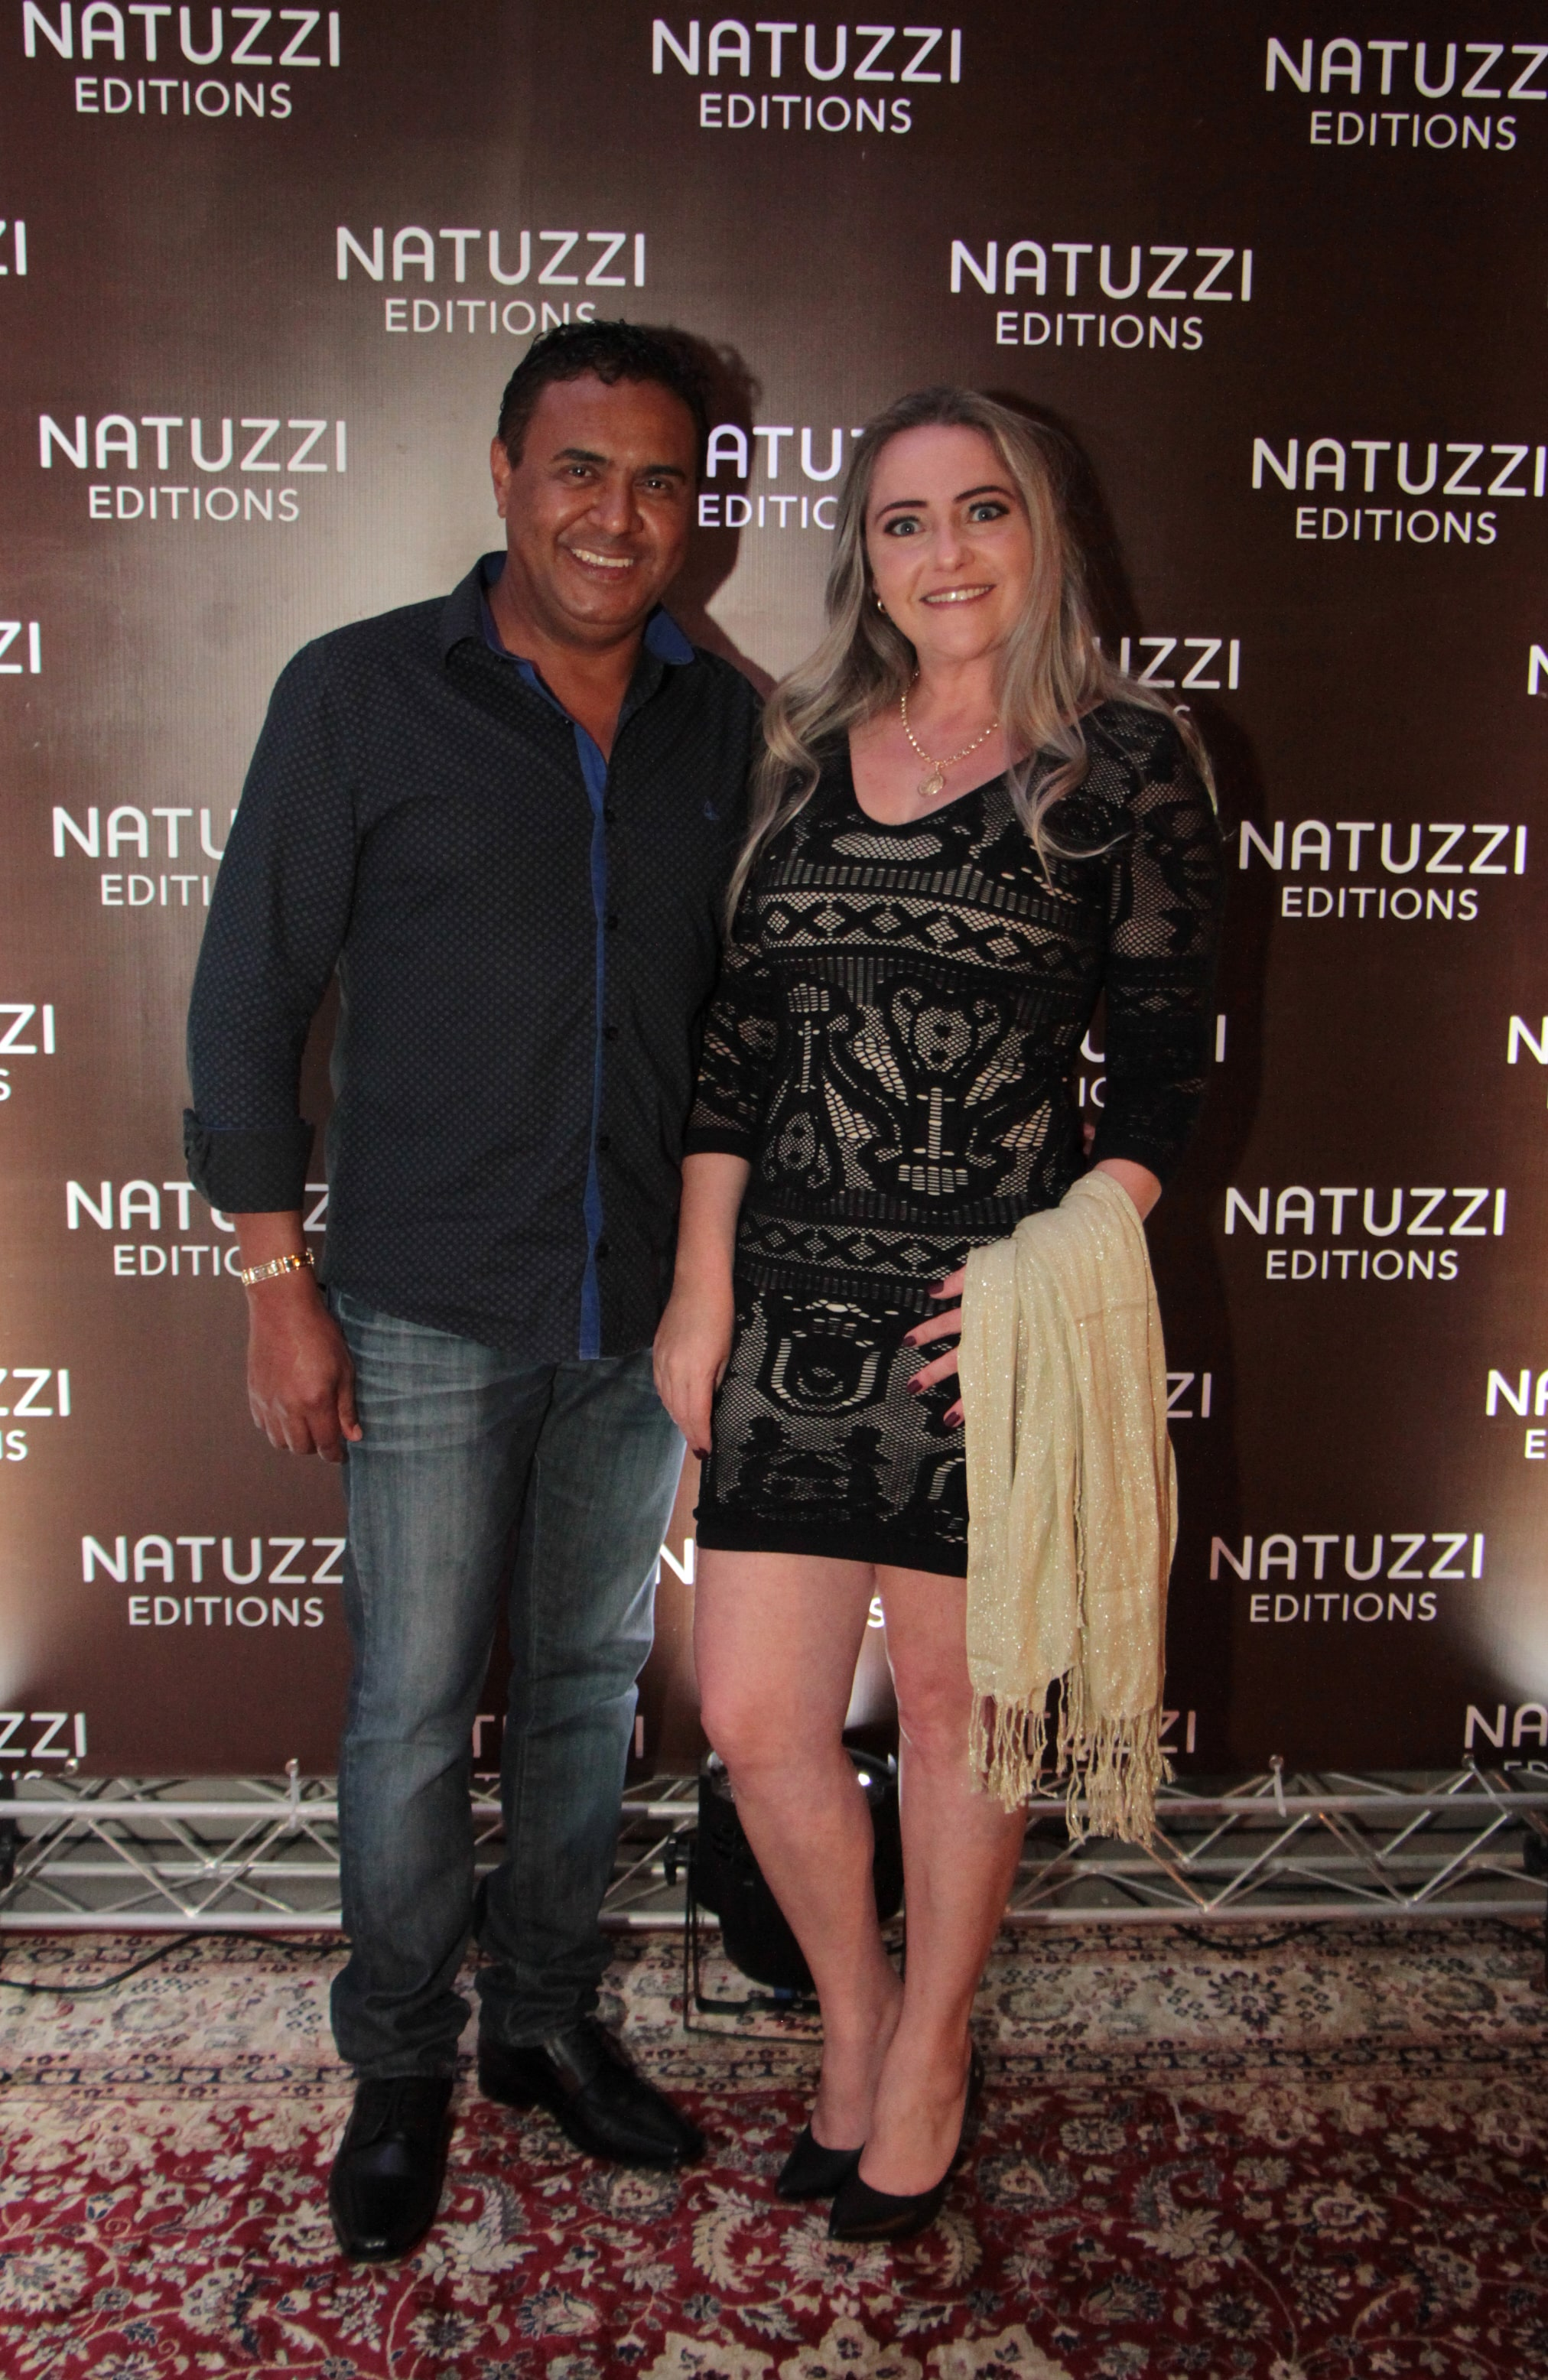 Natuzzi (85)-min.JPG